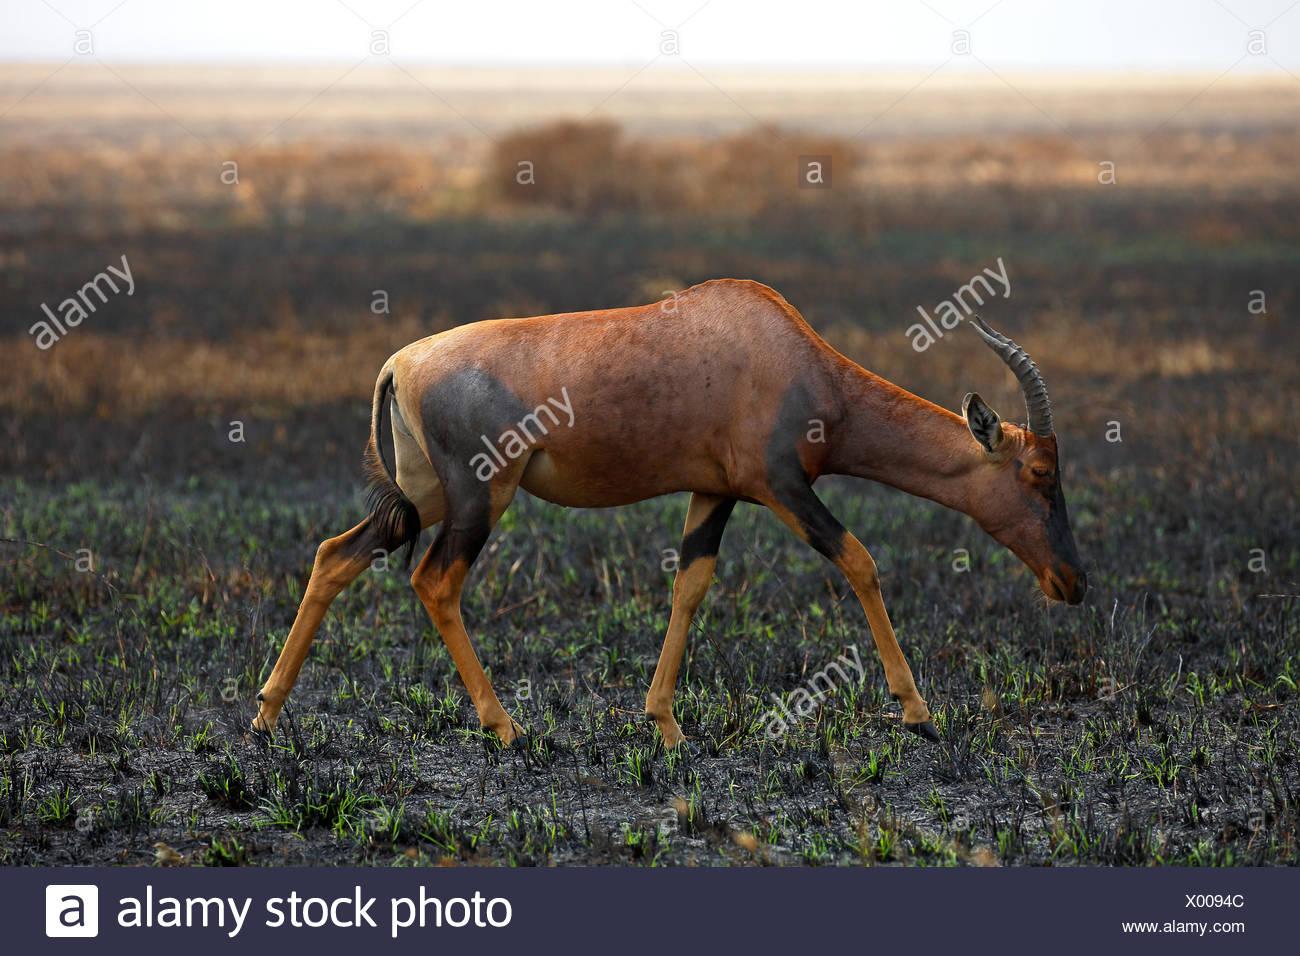 Topi (Damaliscus jimela), antelope traversing the savannah after a fire, Serengeti National Park, Tanzania - Stock Image